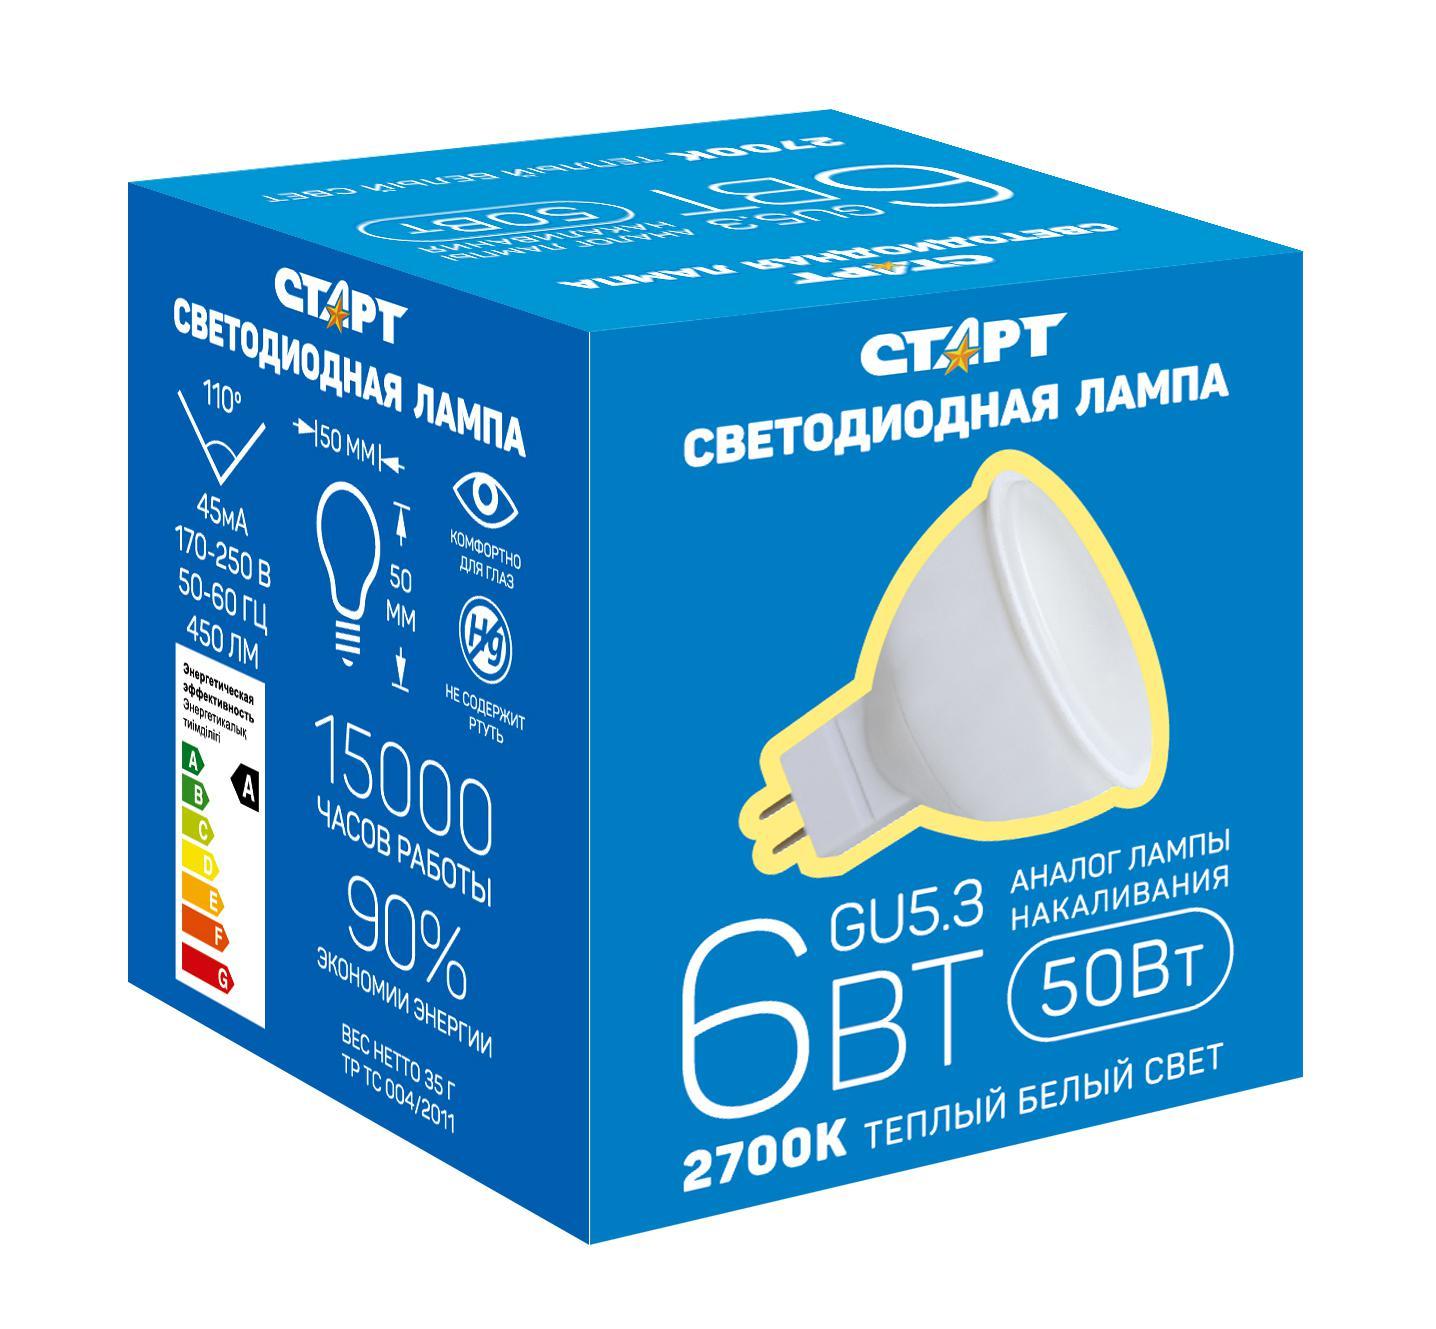 Лампа светодиодная СТАРТ Led jcdr gu5.3 6w 2700К тепл свет. ПРОМОНАБОР